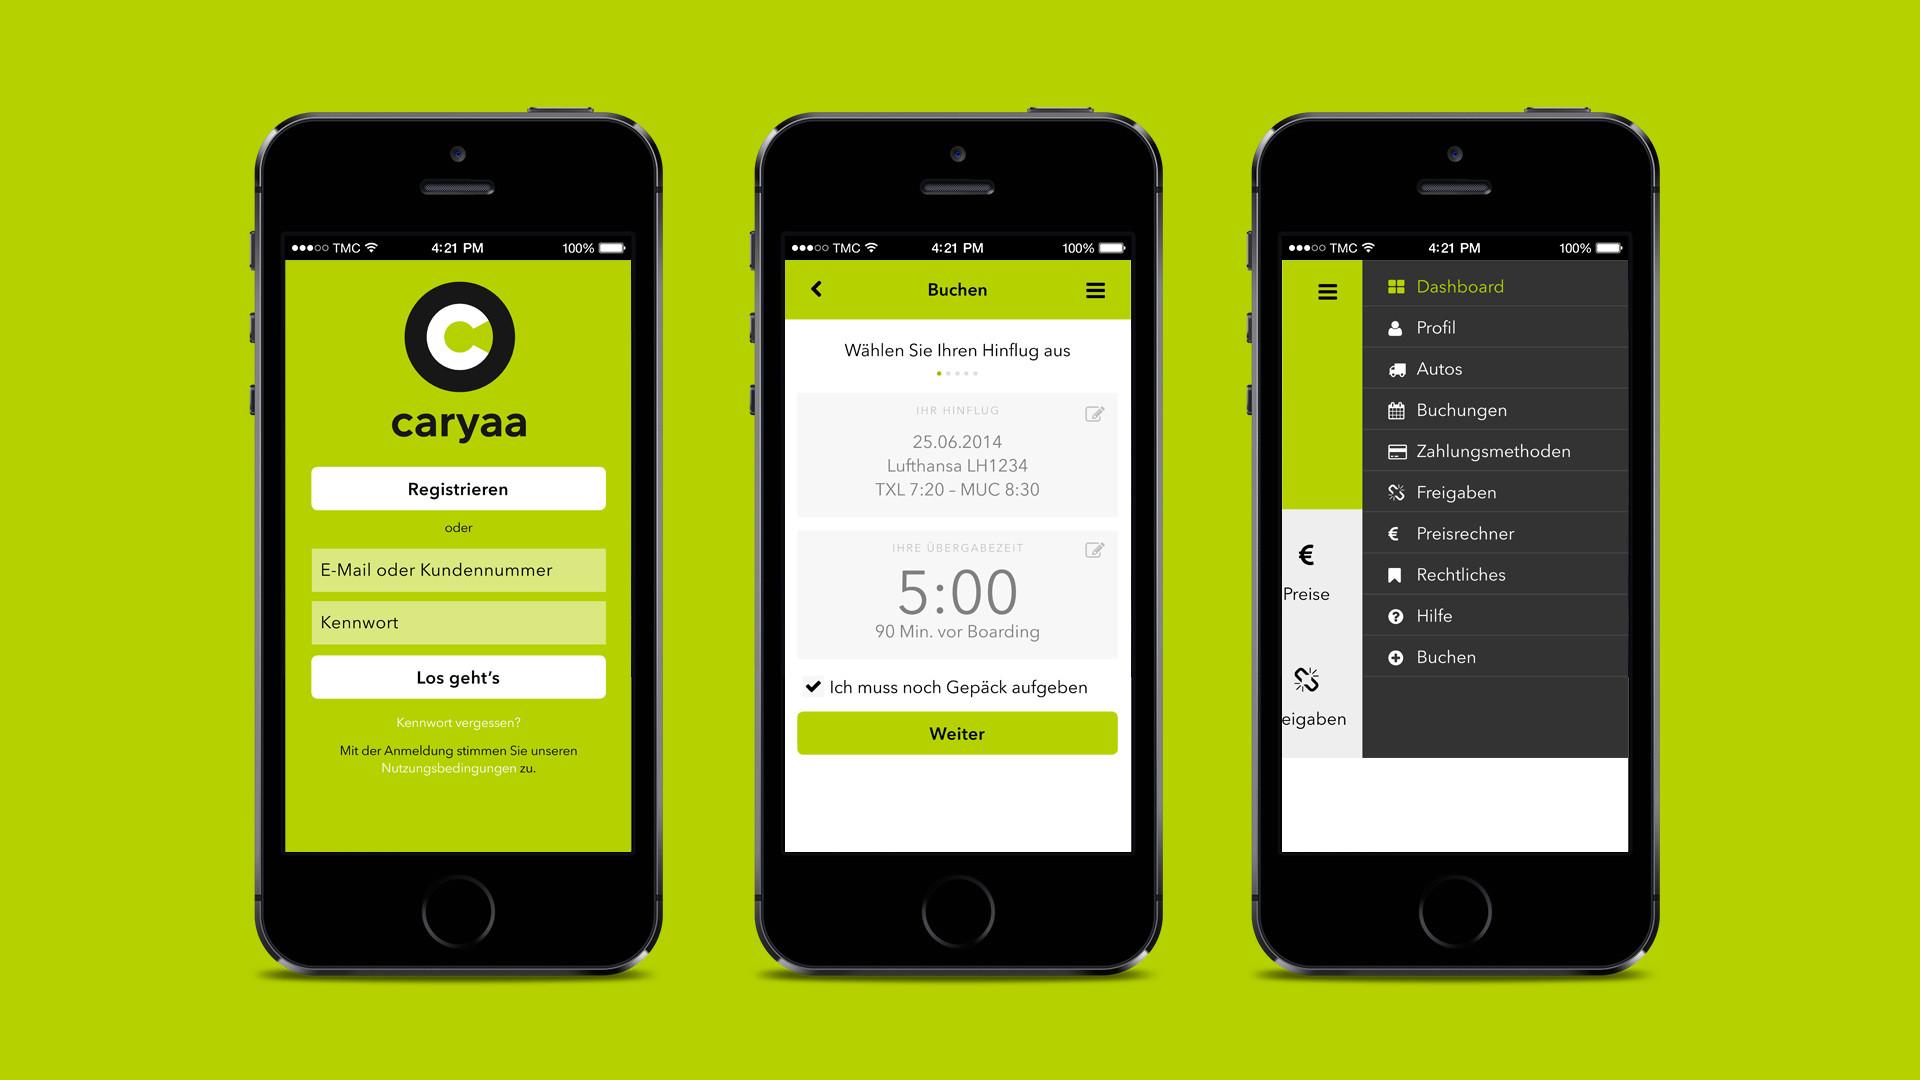 Caryaa-Servicedesign-App-overview,huge.1510708221